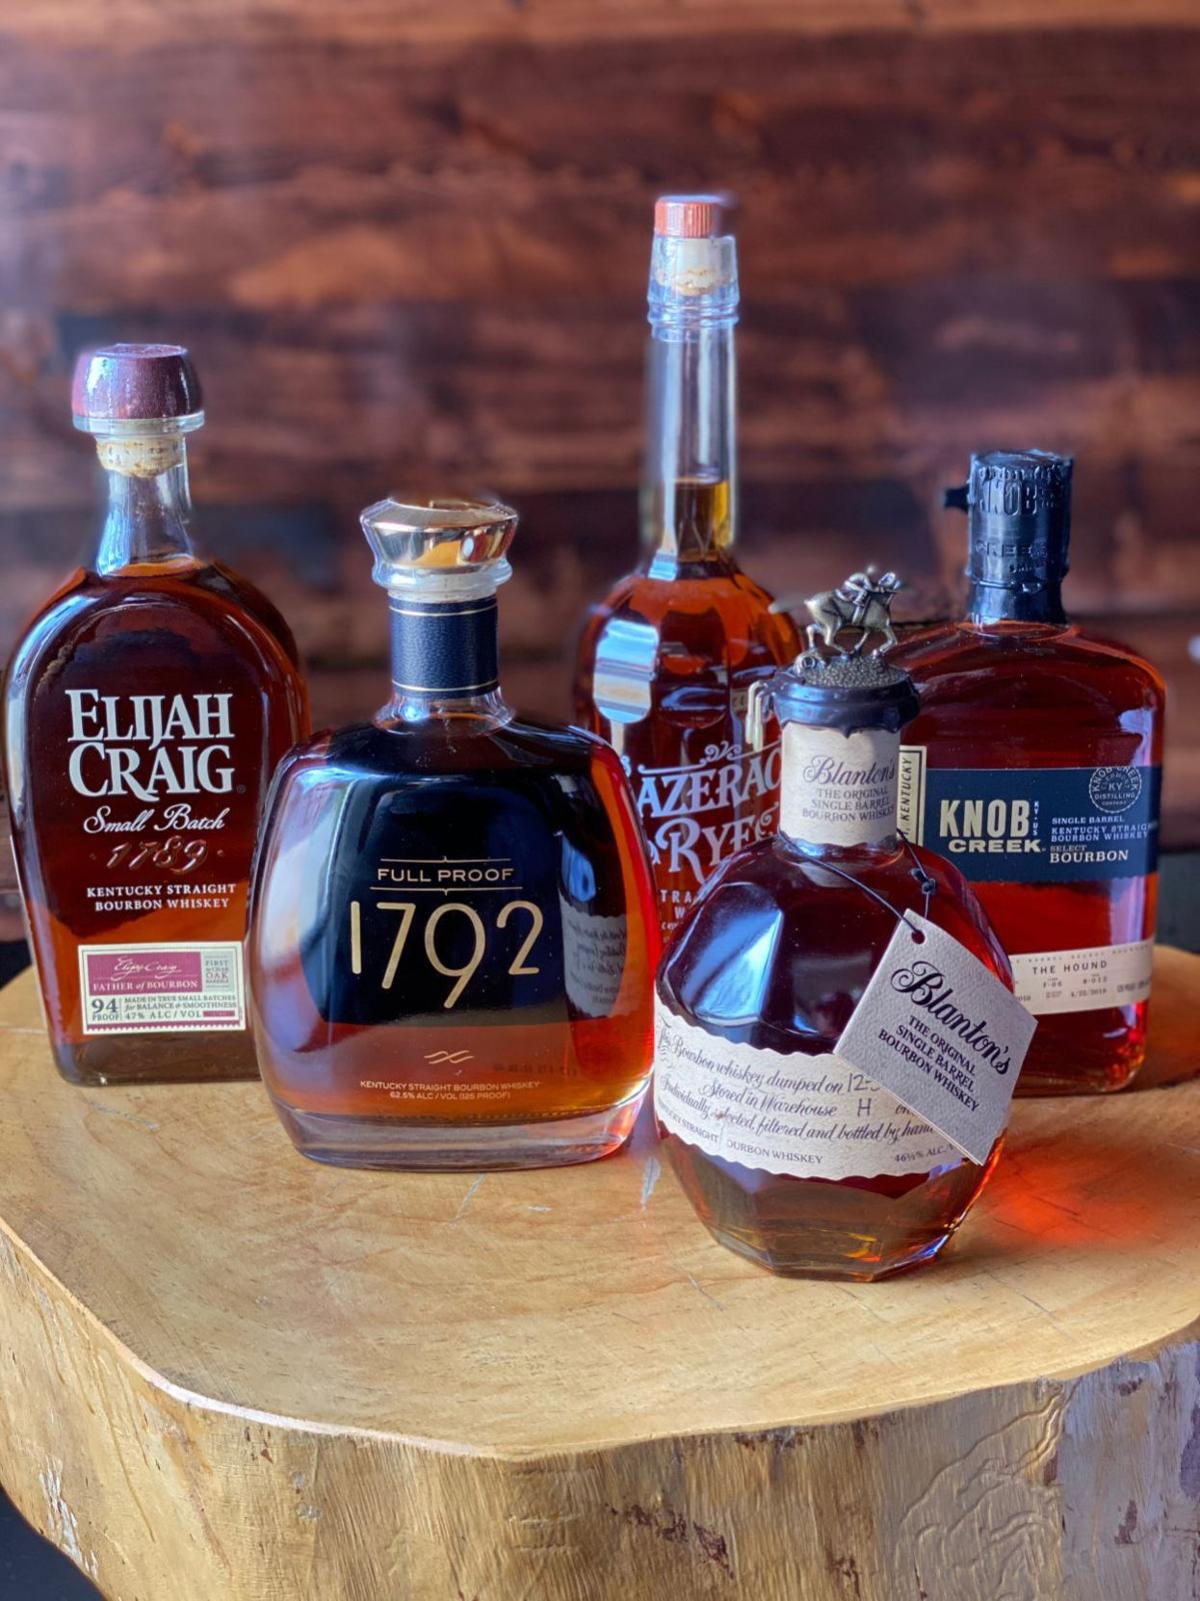 MAIN The Hound Bourbon